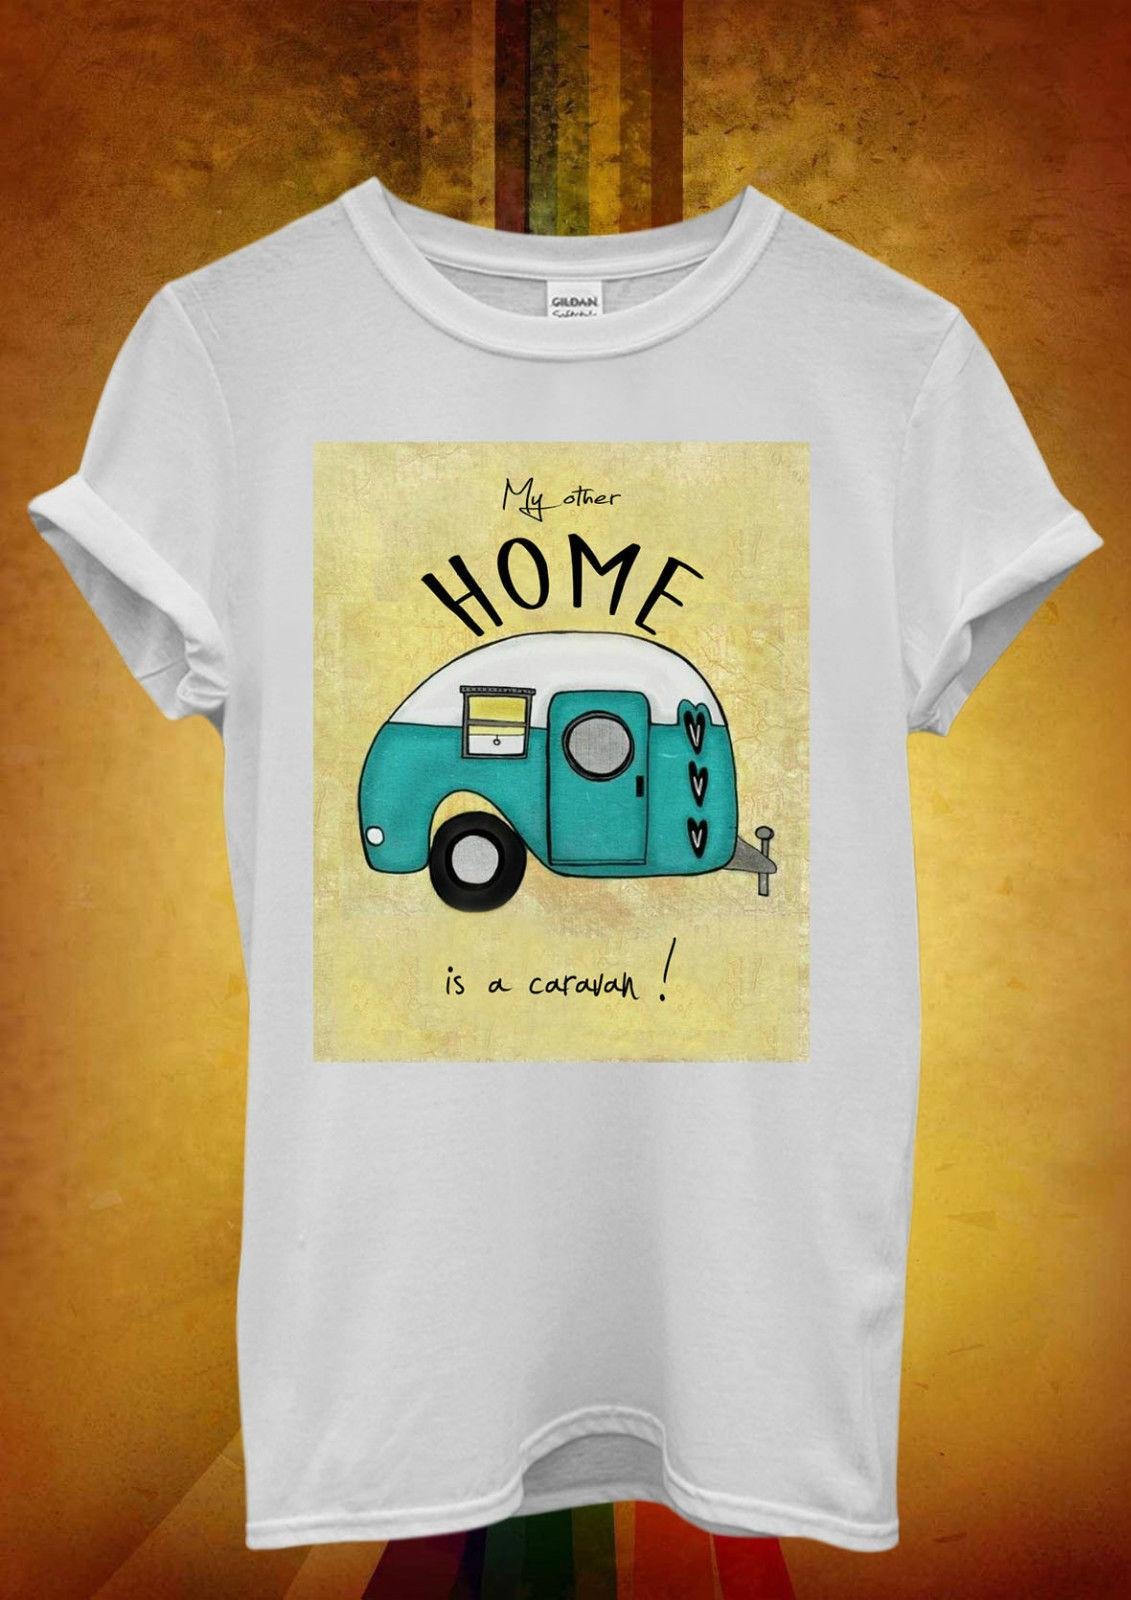 cf7c7ee17 My Other Home Is A Caravan Fun Men Women Unisex T Shirt Top Vest 962 New T  Shirts Funny Tops Tee New Unisex Funny Tops T Shirts Only Awesome Tee From  ...